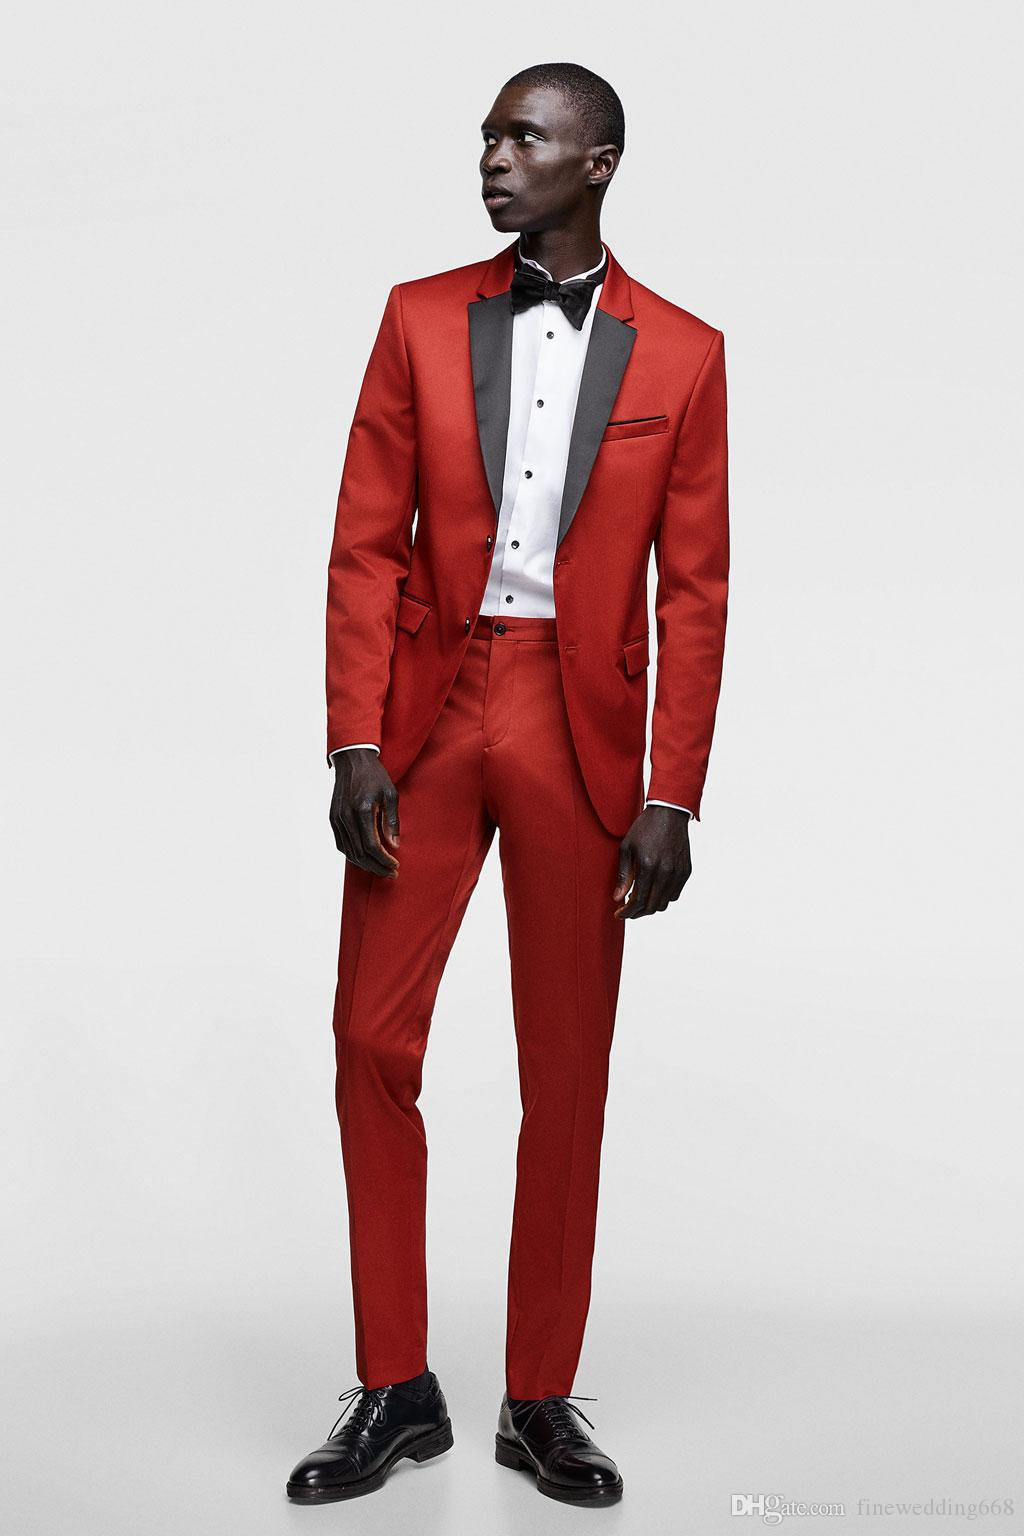 d538c5c882f0 All Loved One Button Groomsmen Notch Lapel Groom Tuxedos Men Suits Wedding/Prom/Dinner  Best Man BlazerJacket+Tie+Pants 039 Formal Trouser Formal Trousers ...